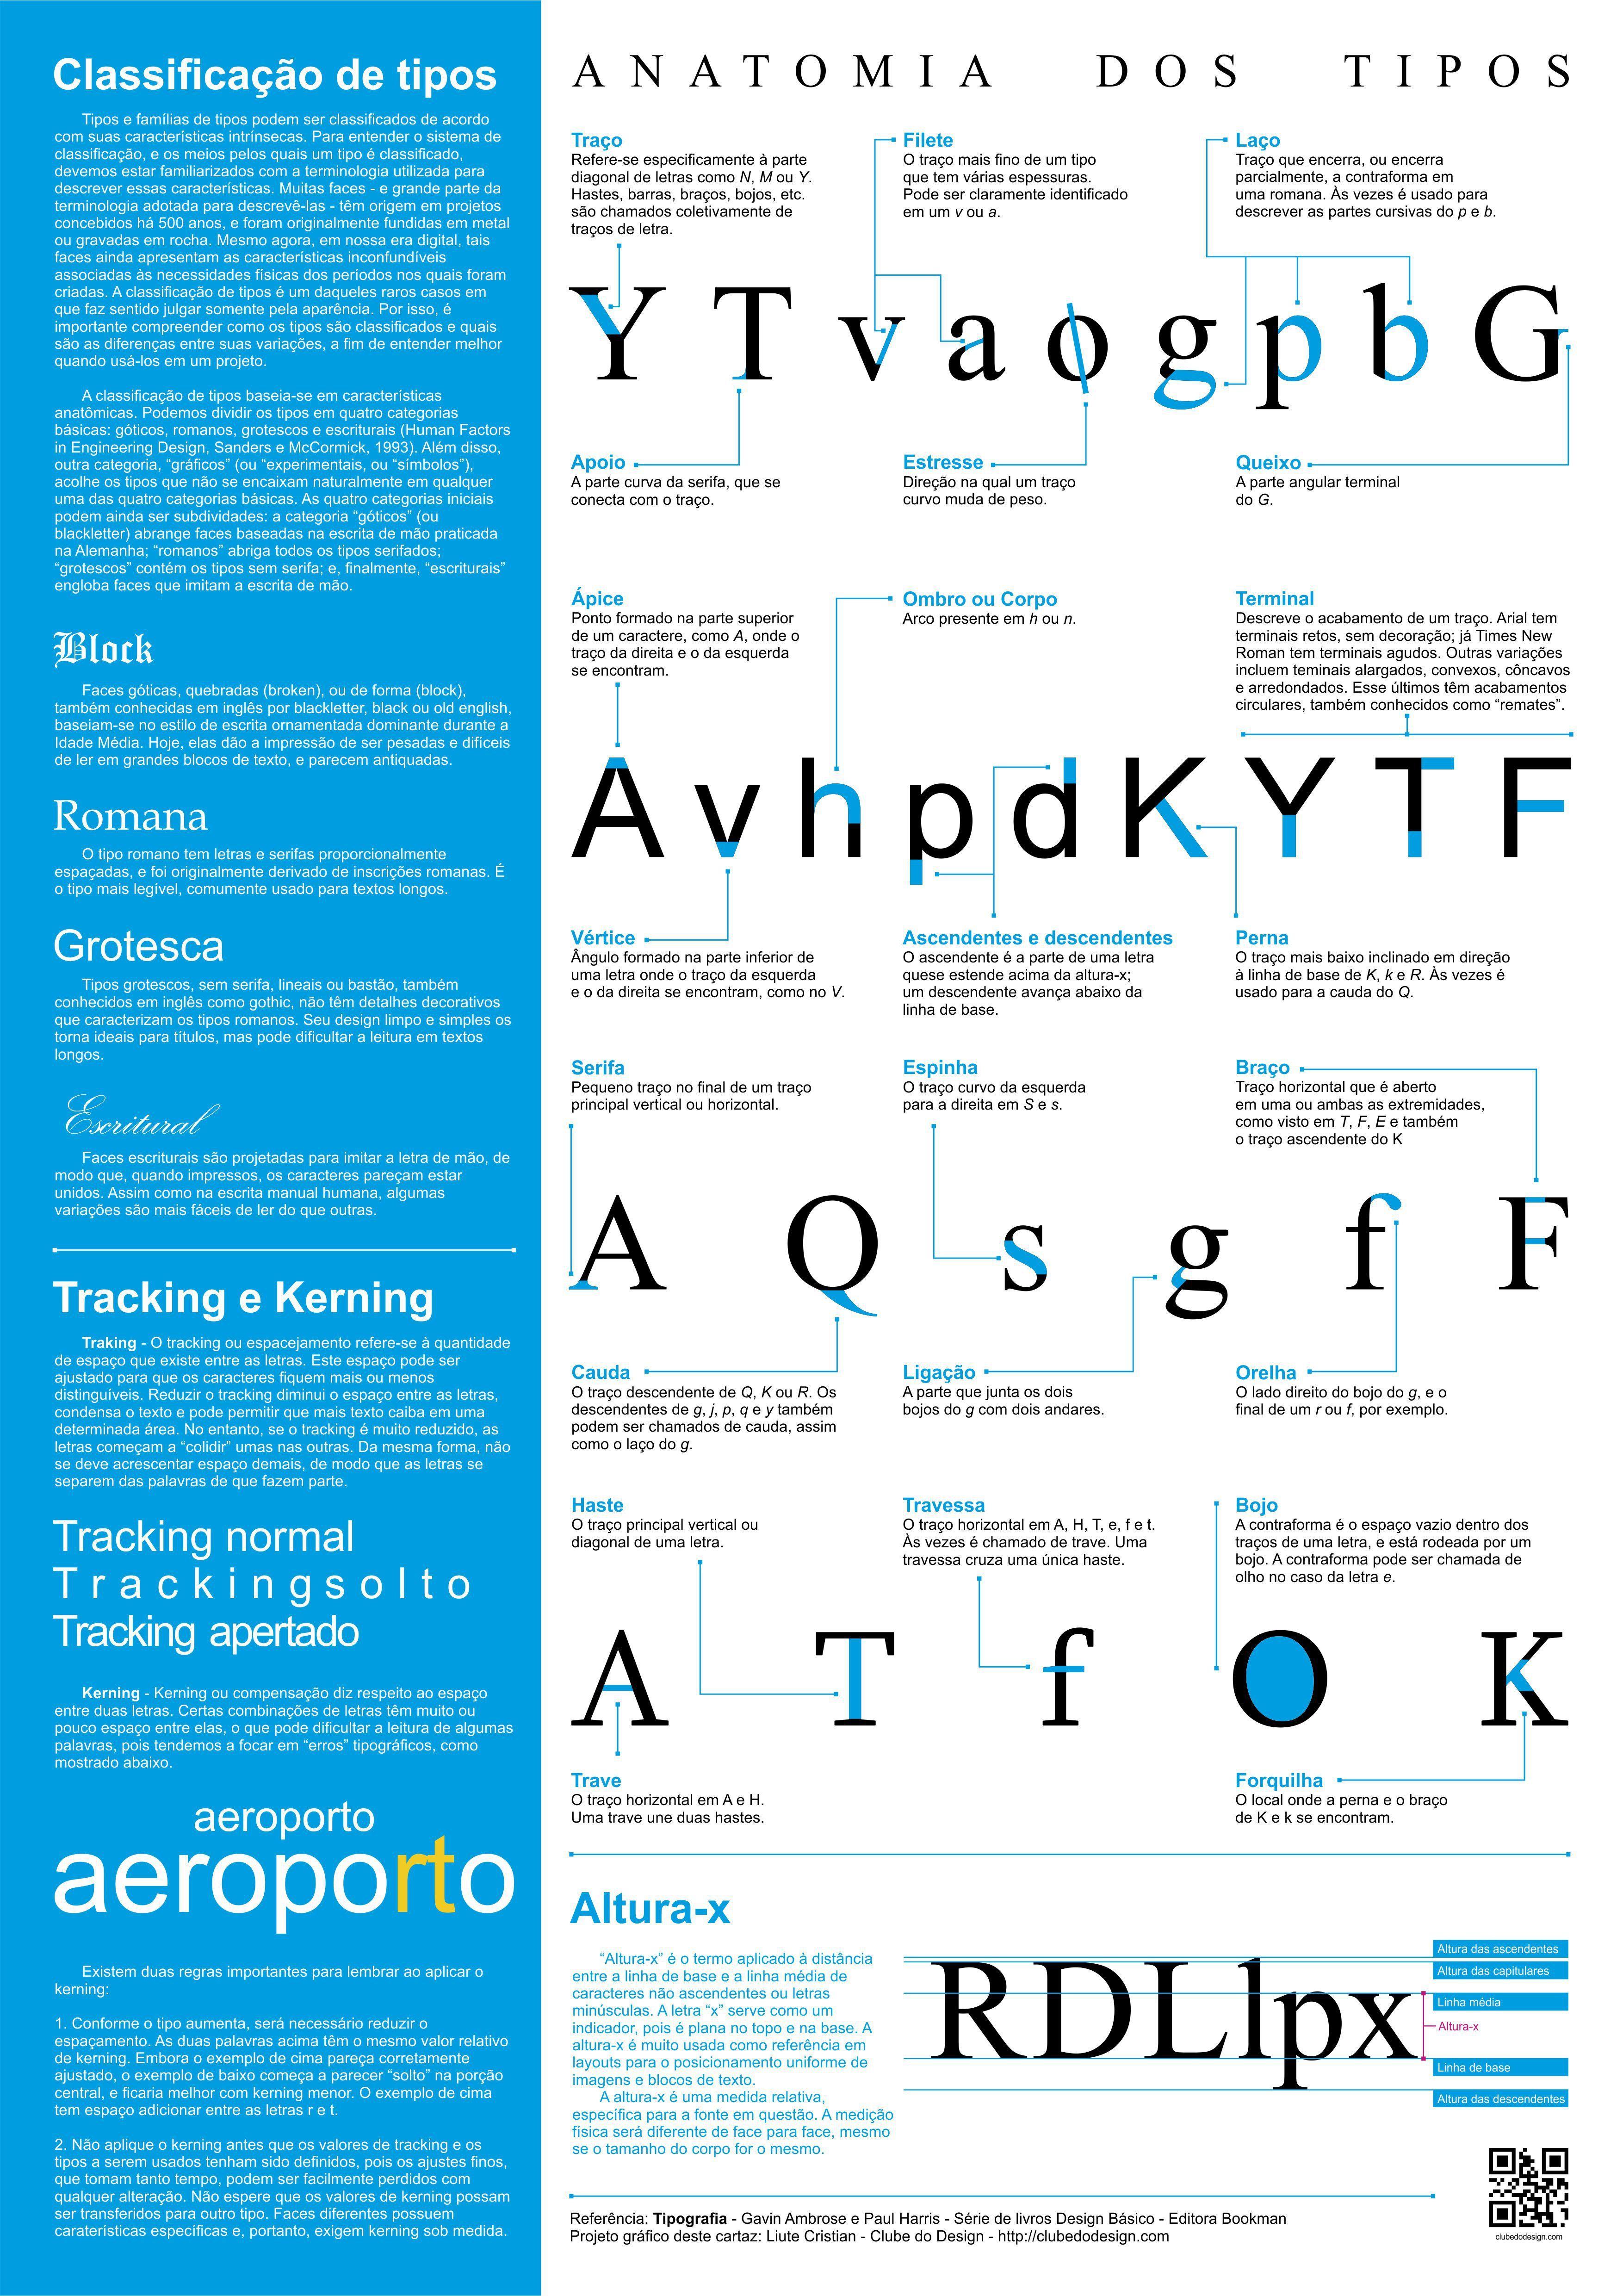 Anatomia dos Tipos - tipografia - nomenclaturas | Anatomía ...